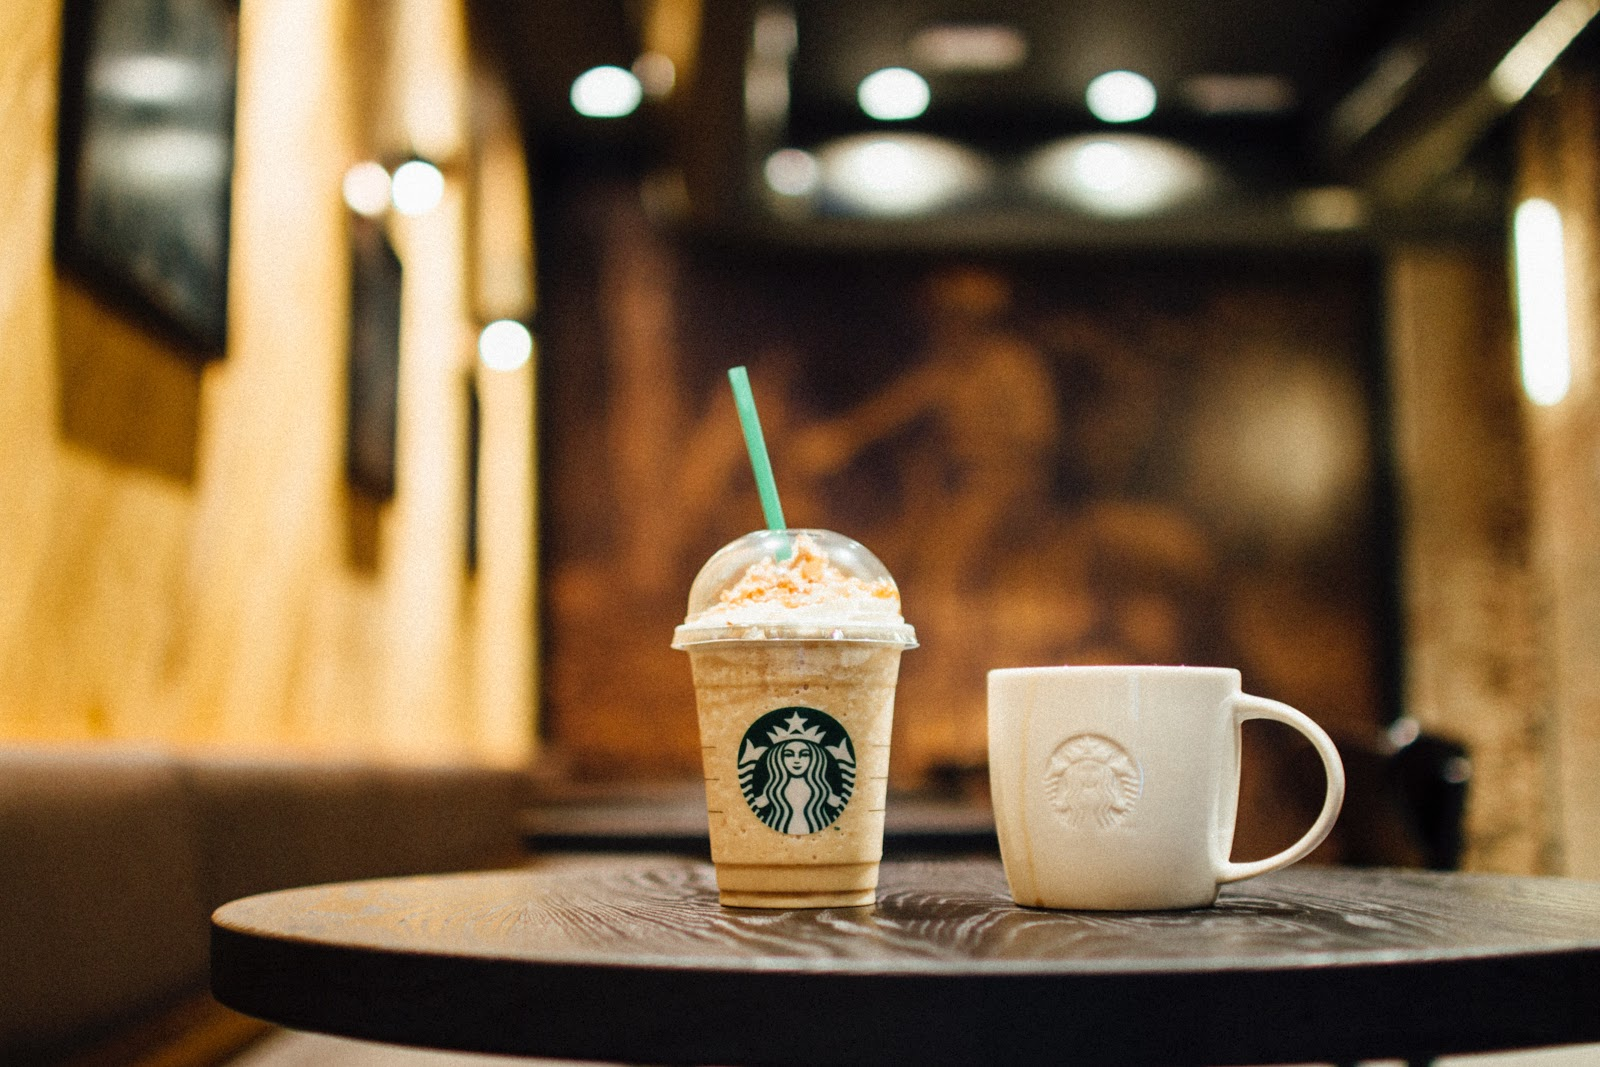 Starbucks cups - Image credit: pexels.com